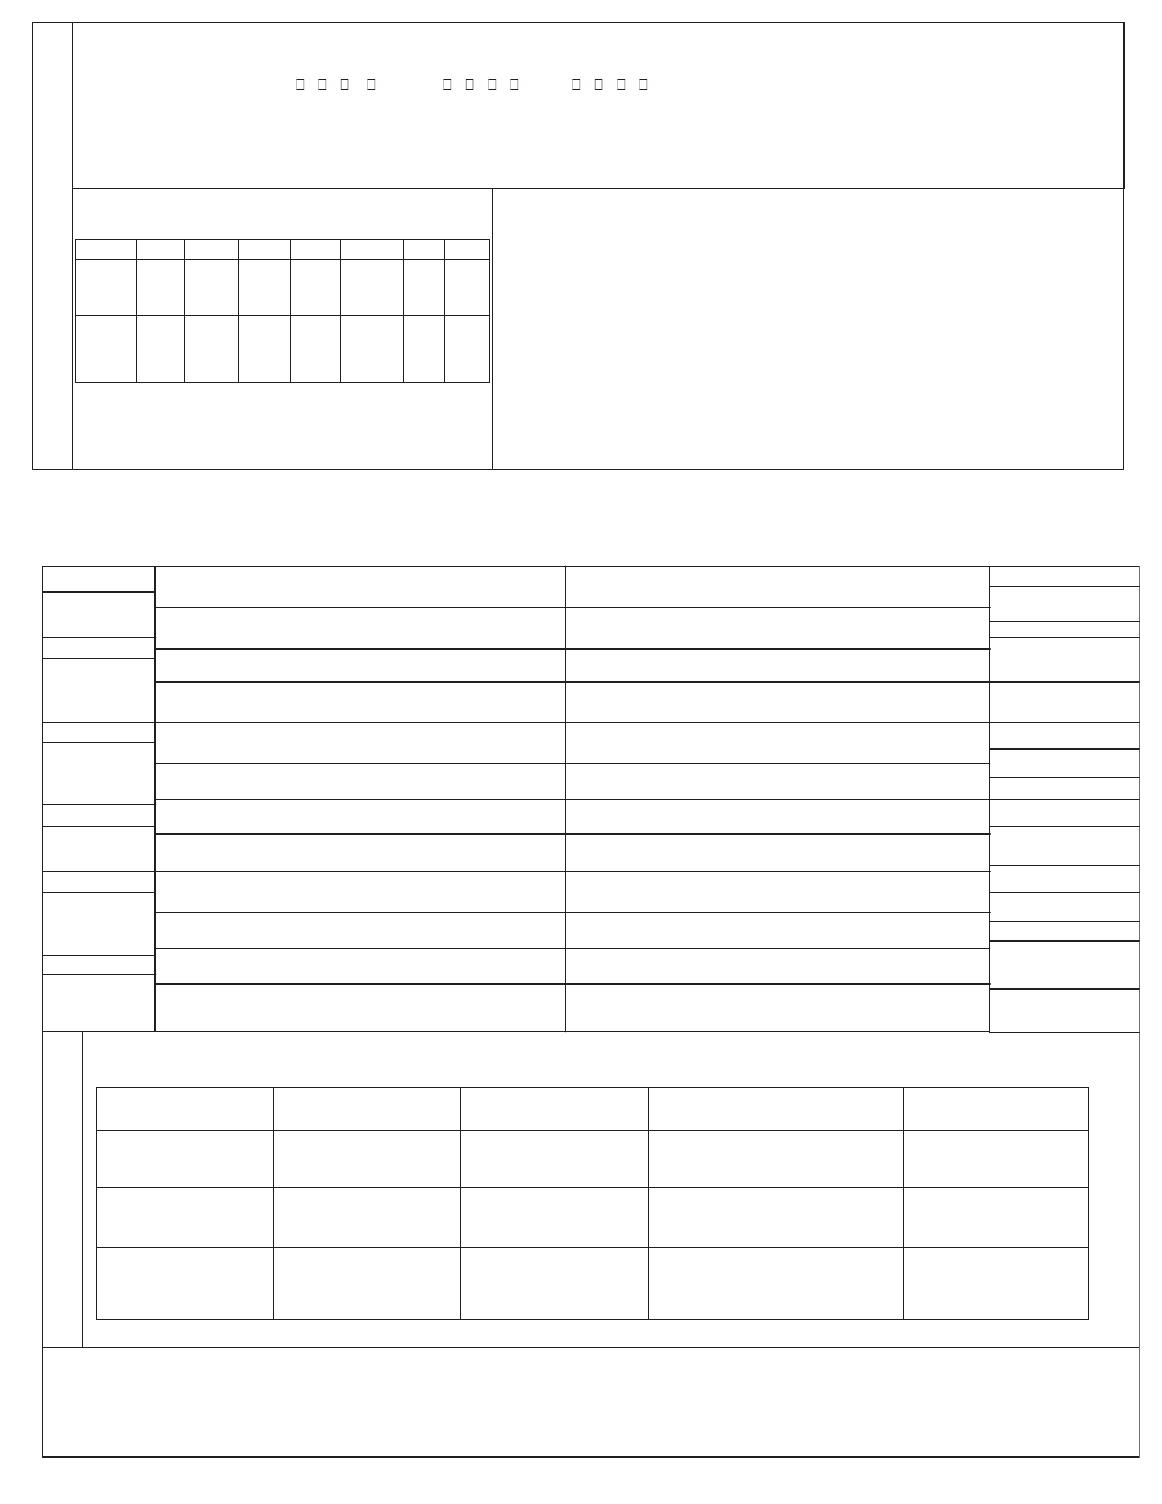 Free Printable Sally Beauty Job Application Form Page 2